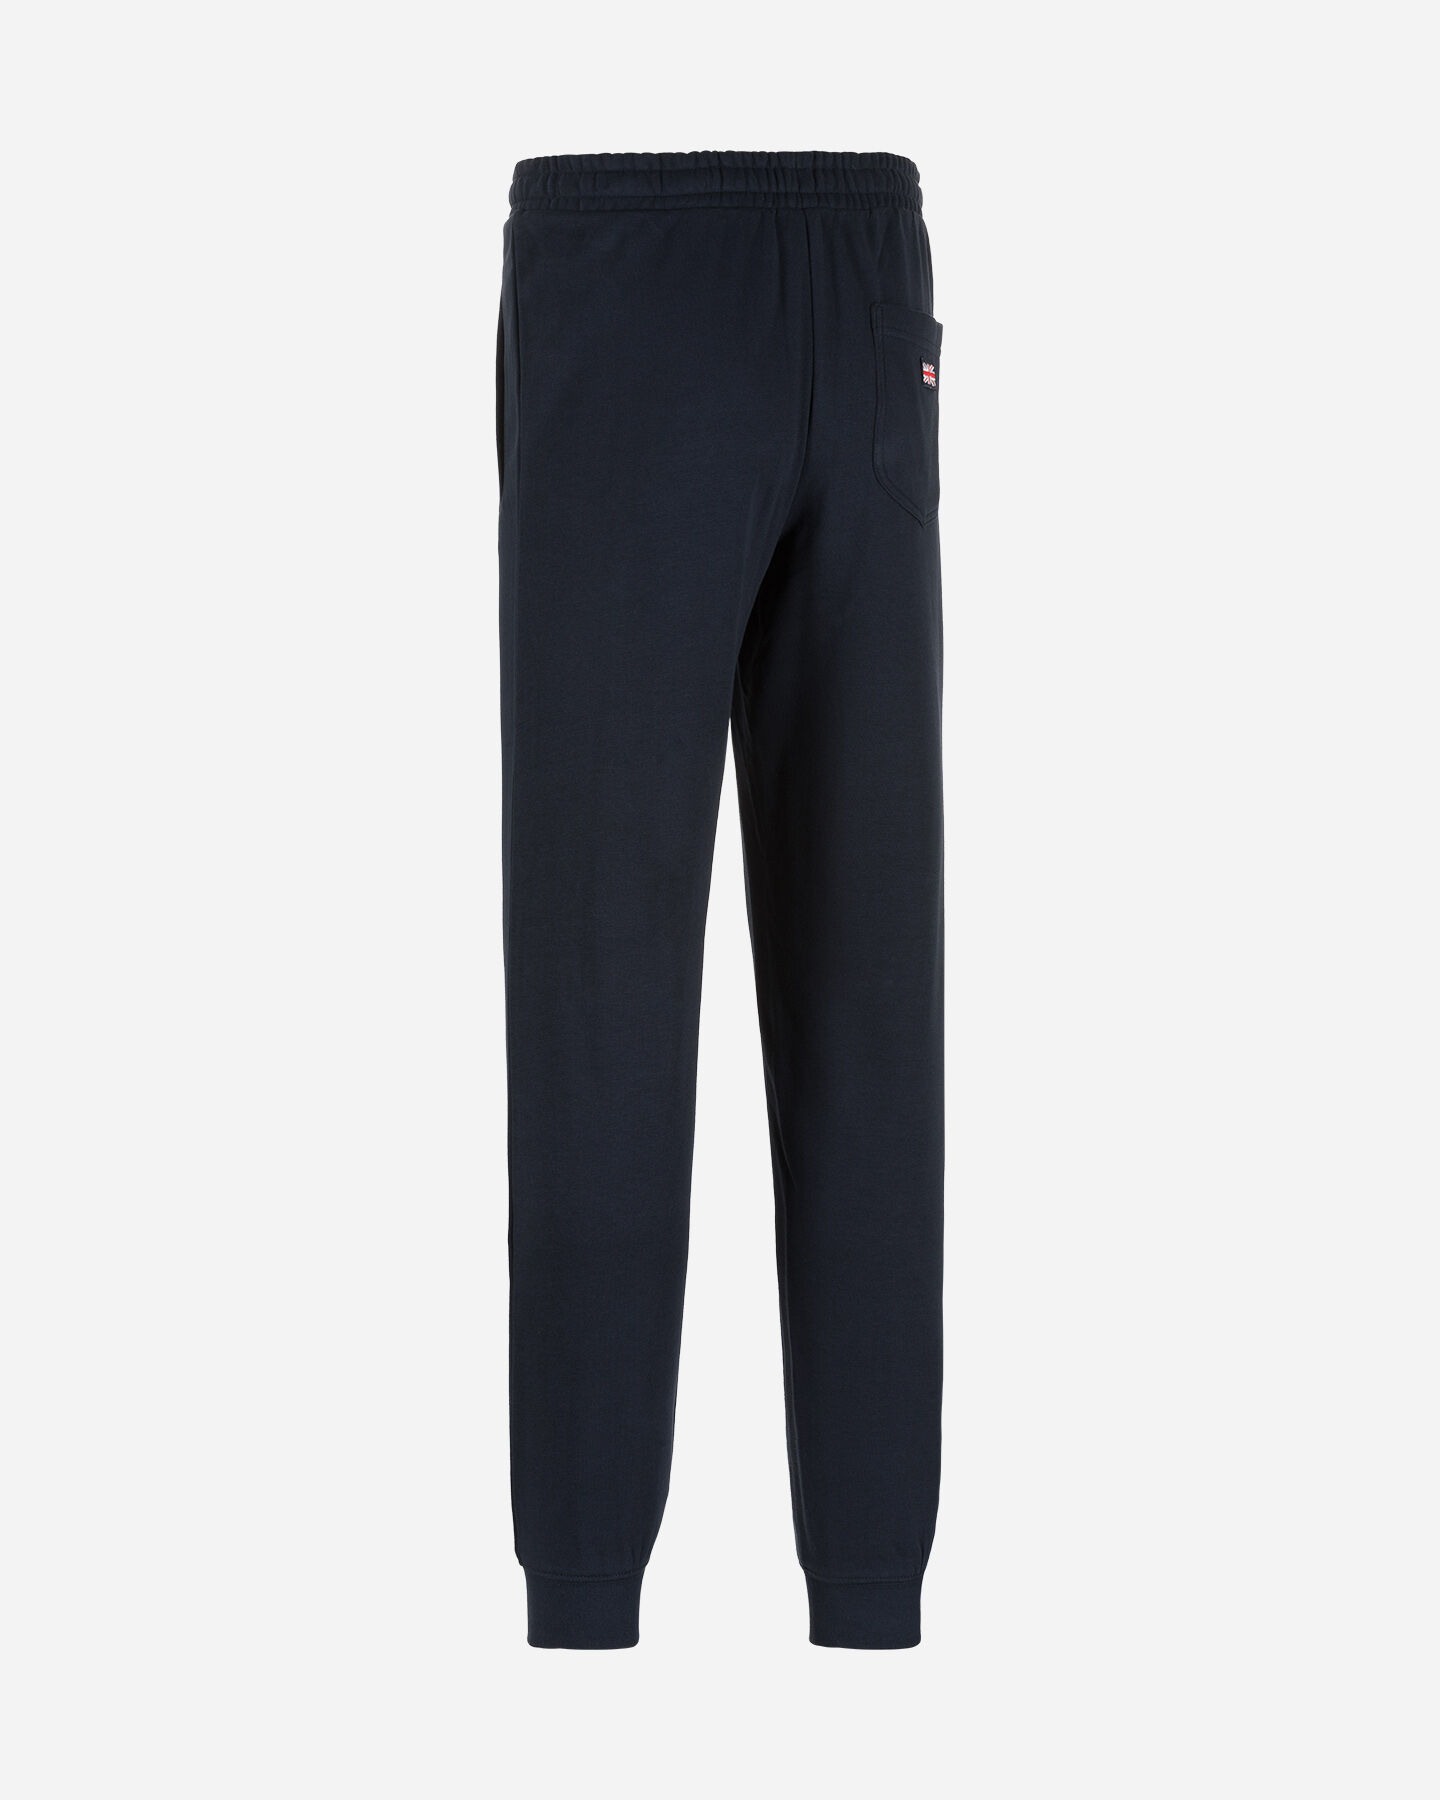 Pantalone ADMIRAL BASIC LOGO M S4067297 scatto 1